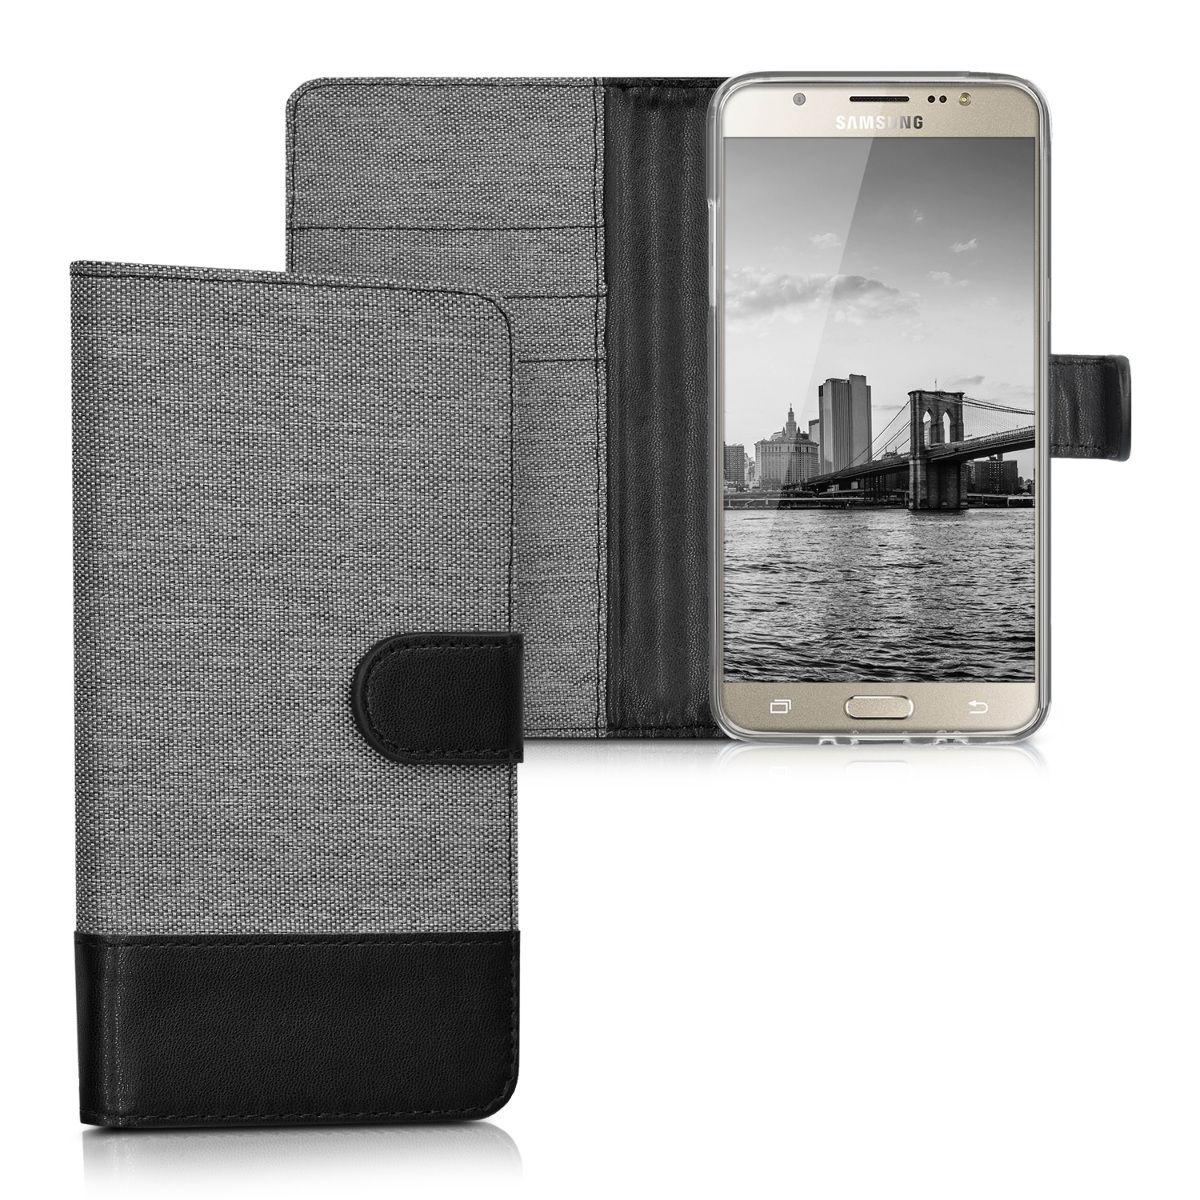 Pouzdro pro Samsung Galaxy J5 (2016) šedé